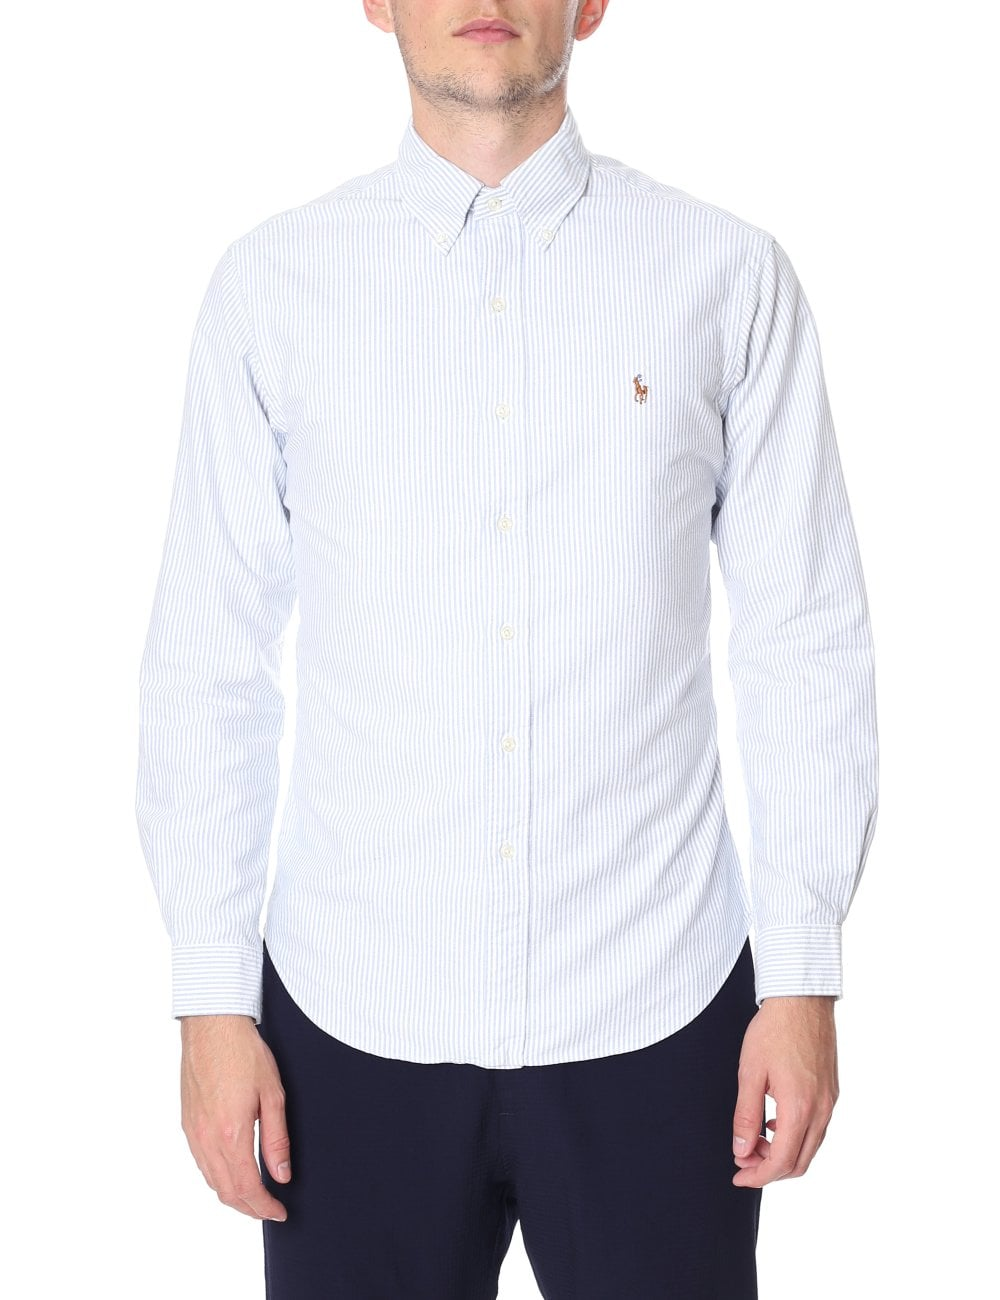 069ff5f4cf Polo Ralph Lauren Men's Slim Fit Stripe Long Sleeve Shirt